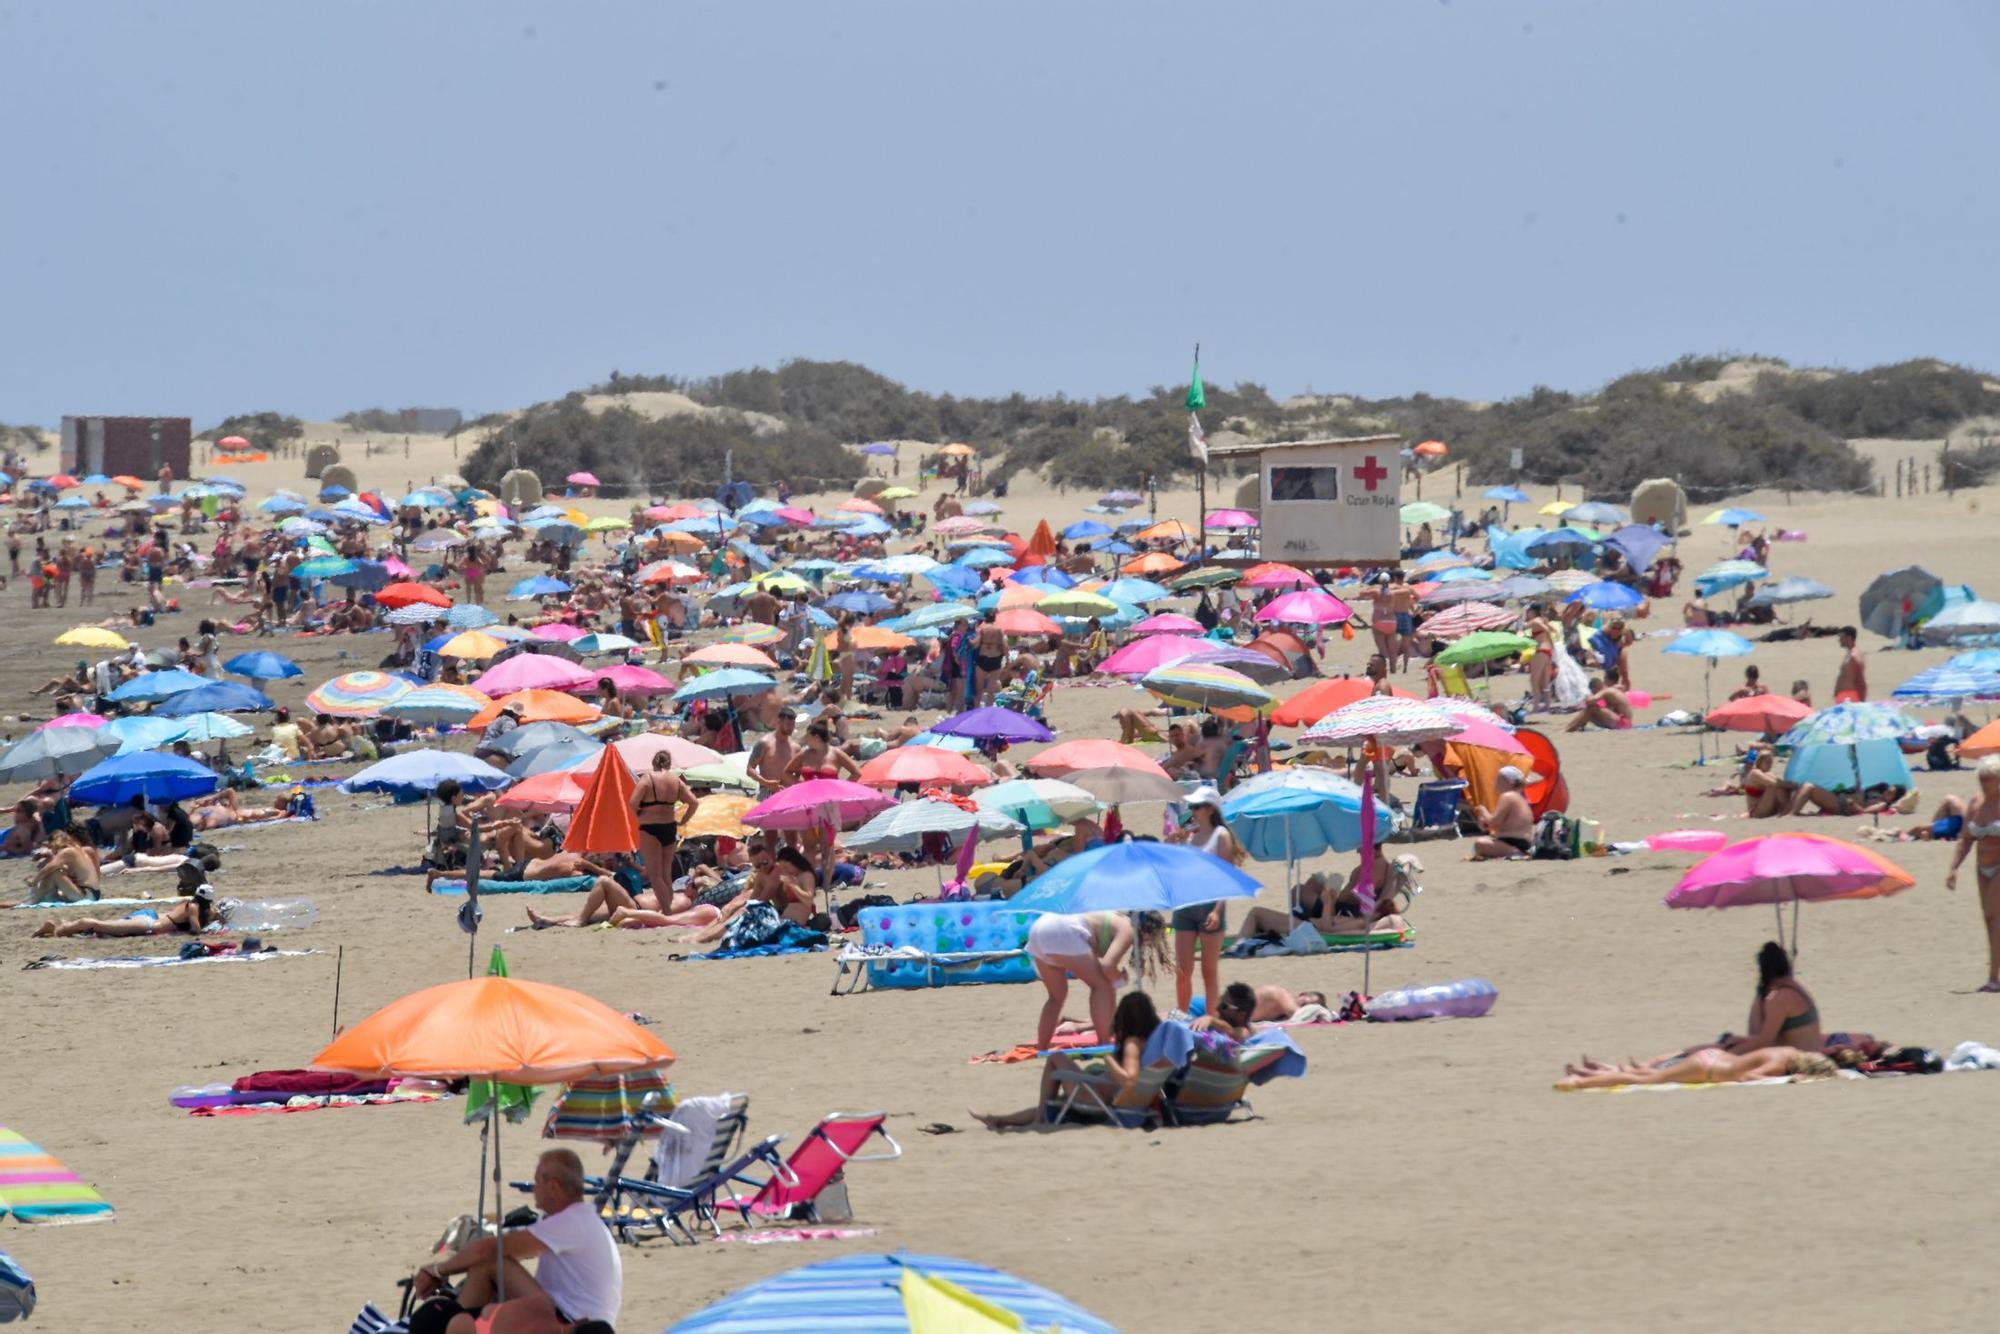 Ola de calor en Gran Canaria (16/07/2021)